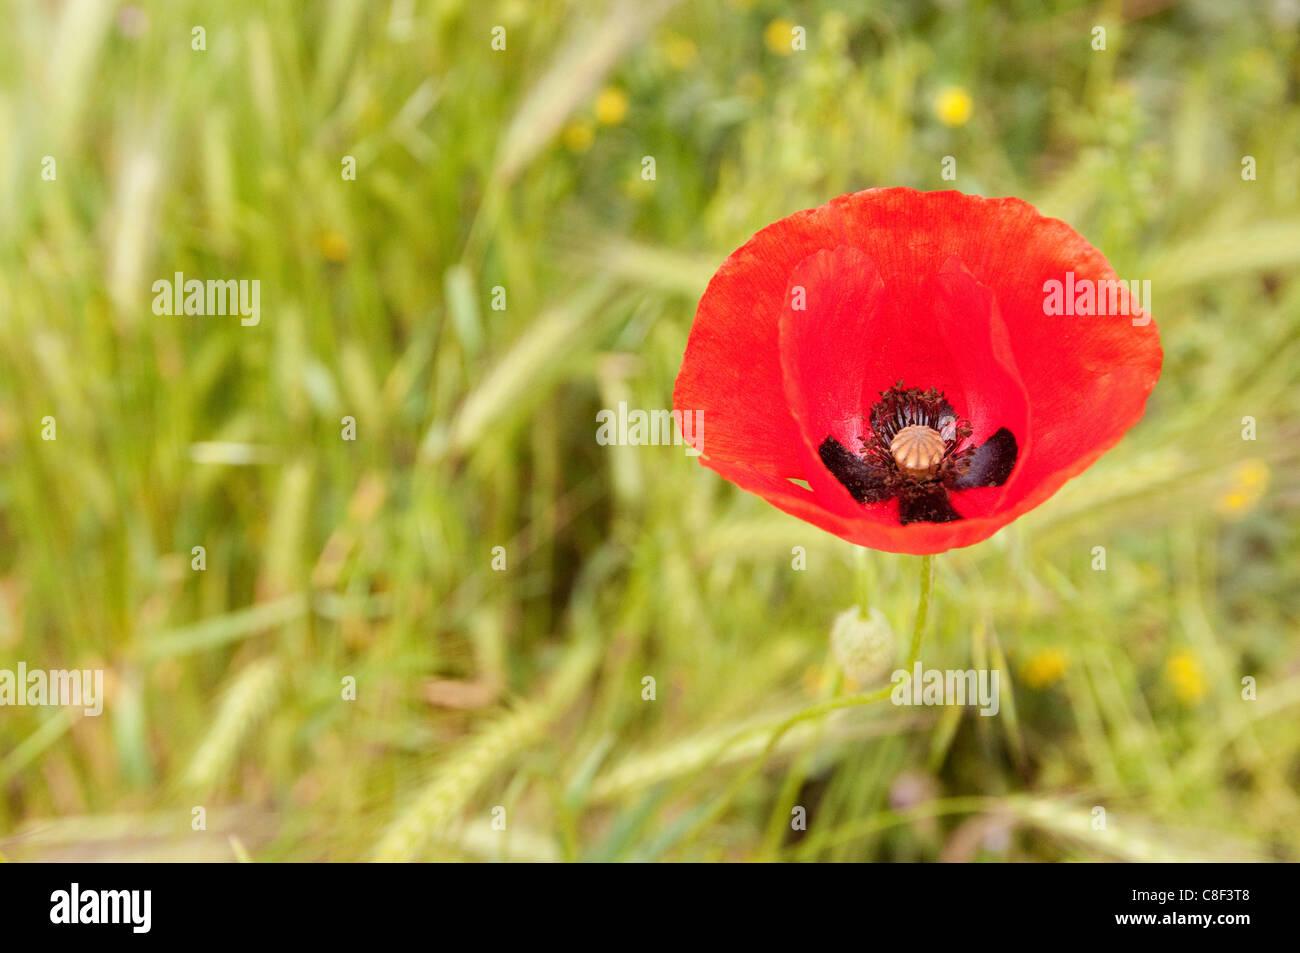 Red poppy flower cappadocia turkey stock photo 39670296 alamy red poppy flower cappadocia turkey mightylinksfo